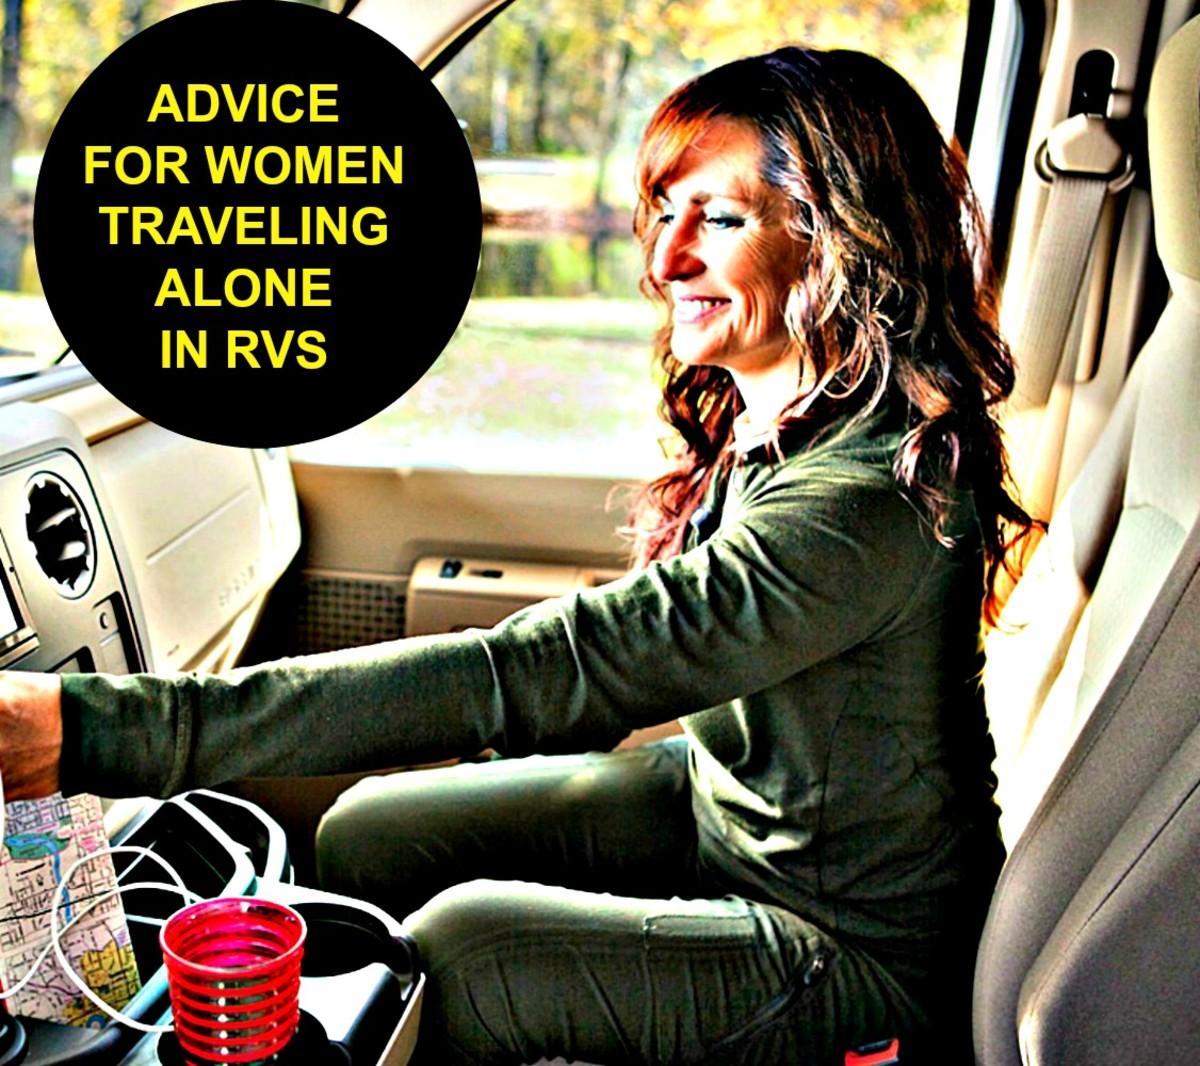 Advice for Women Traveling Alone in RVs | WanderWisdom